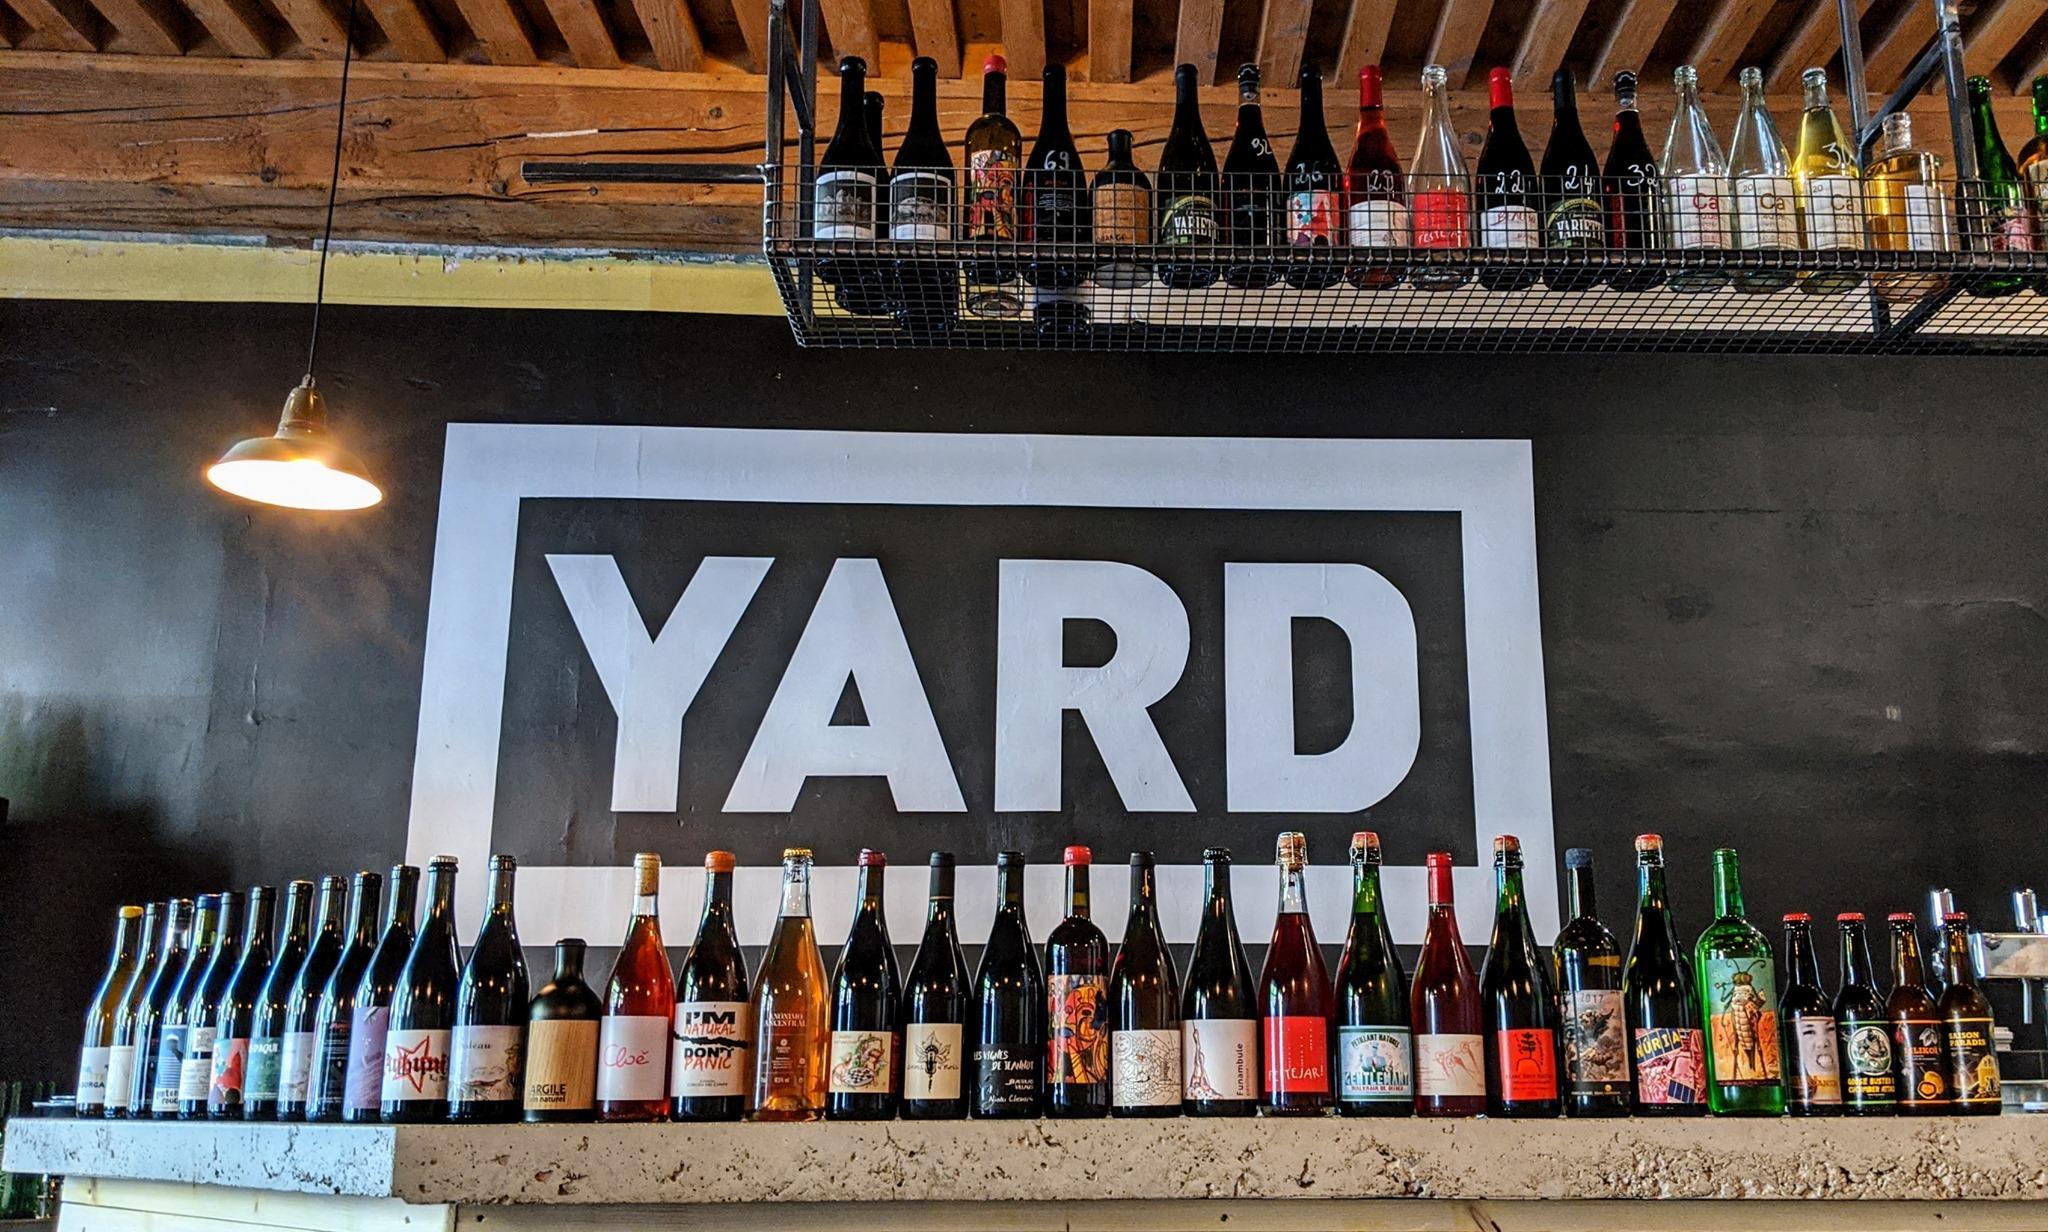 Yard Lyon